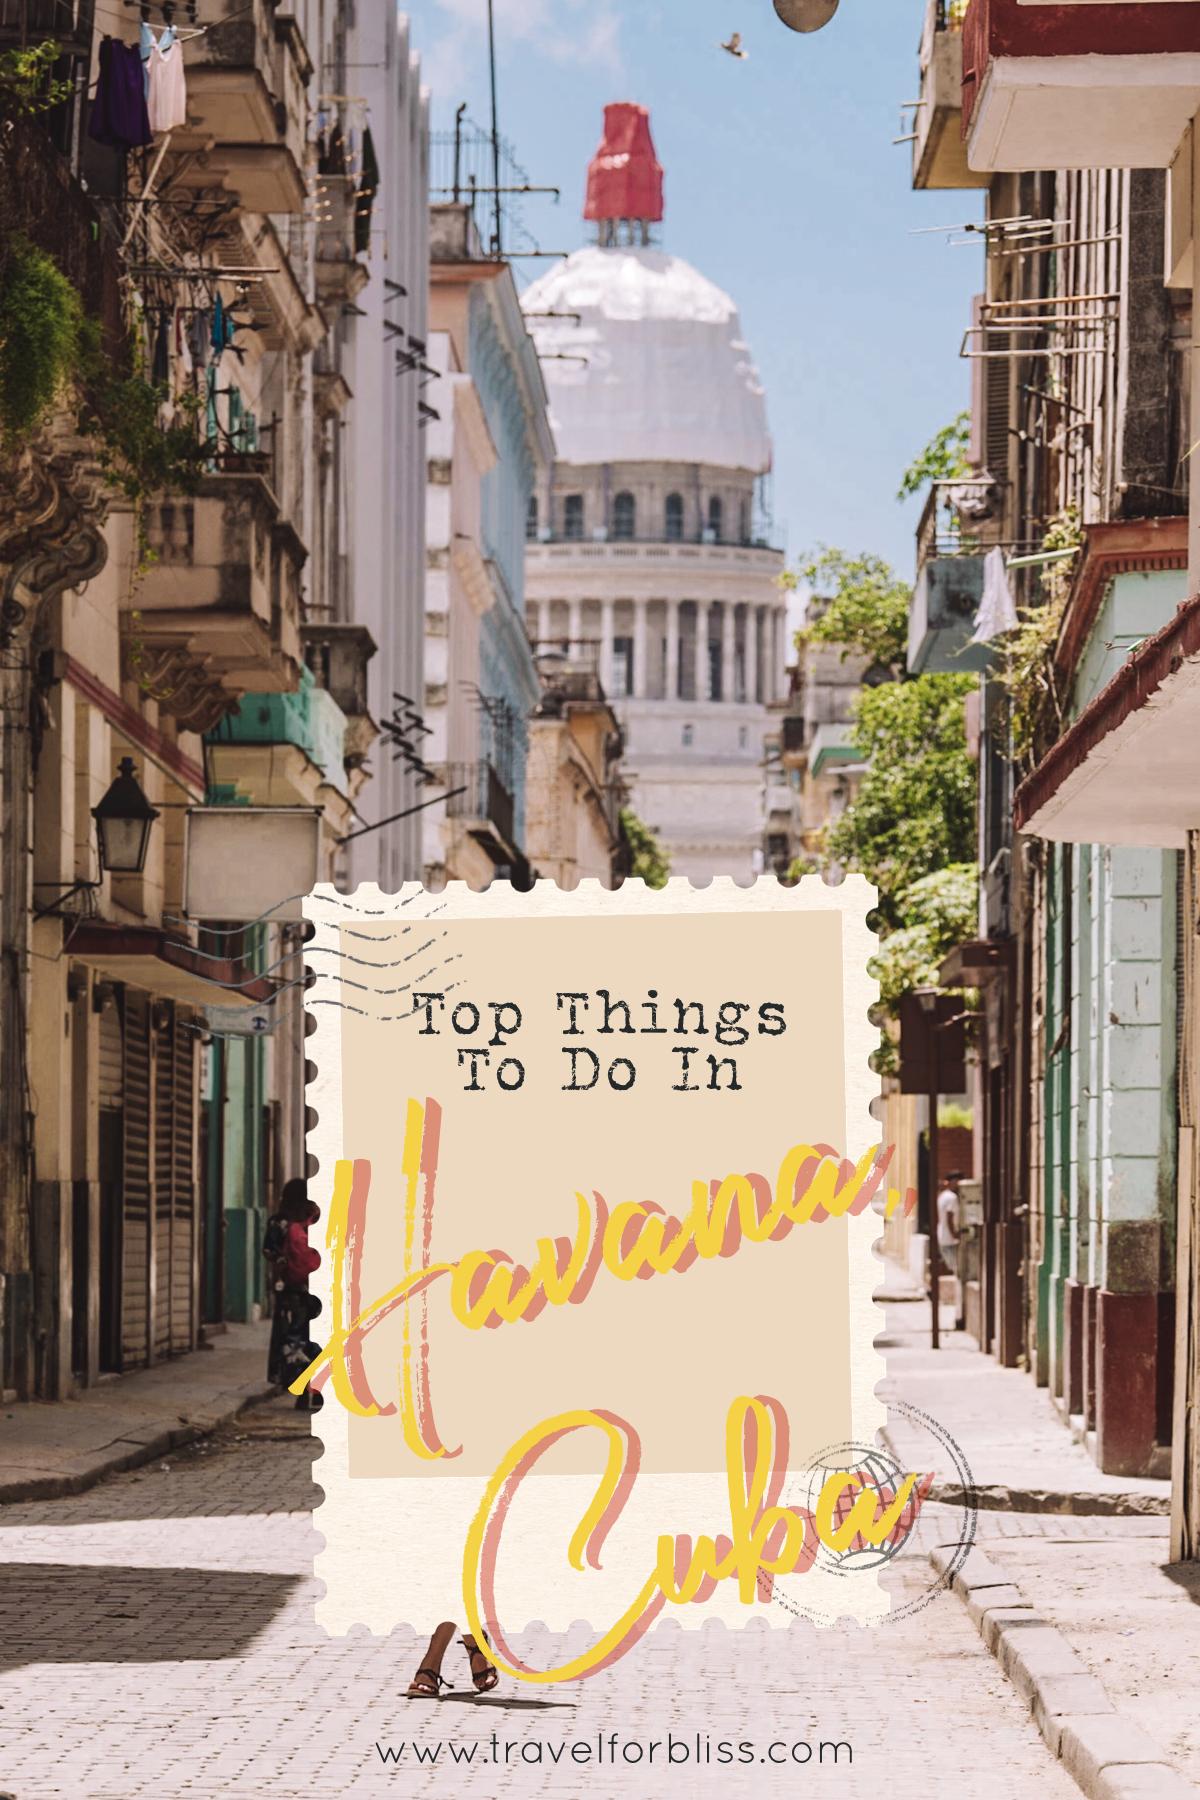 Top Things To Do In Havana Cuba